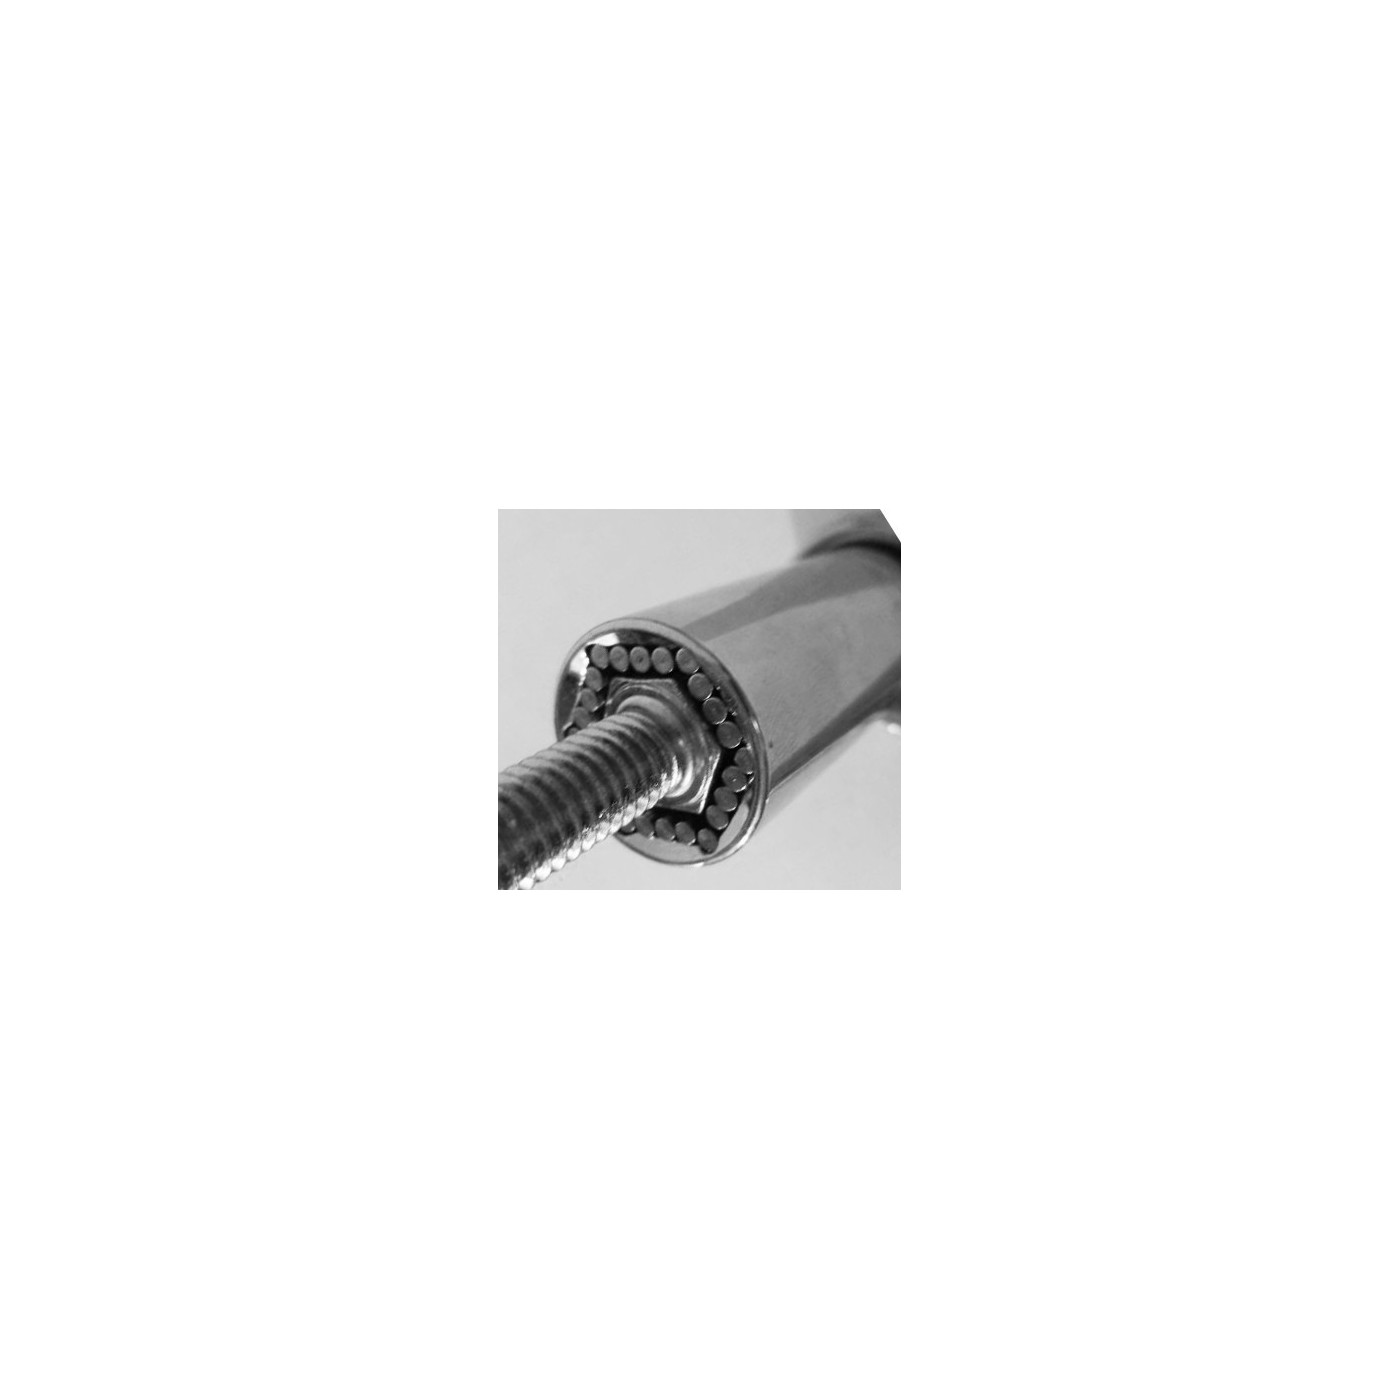 Gator grip MEDIUM, universal socket wrench 9-27mm